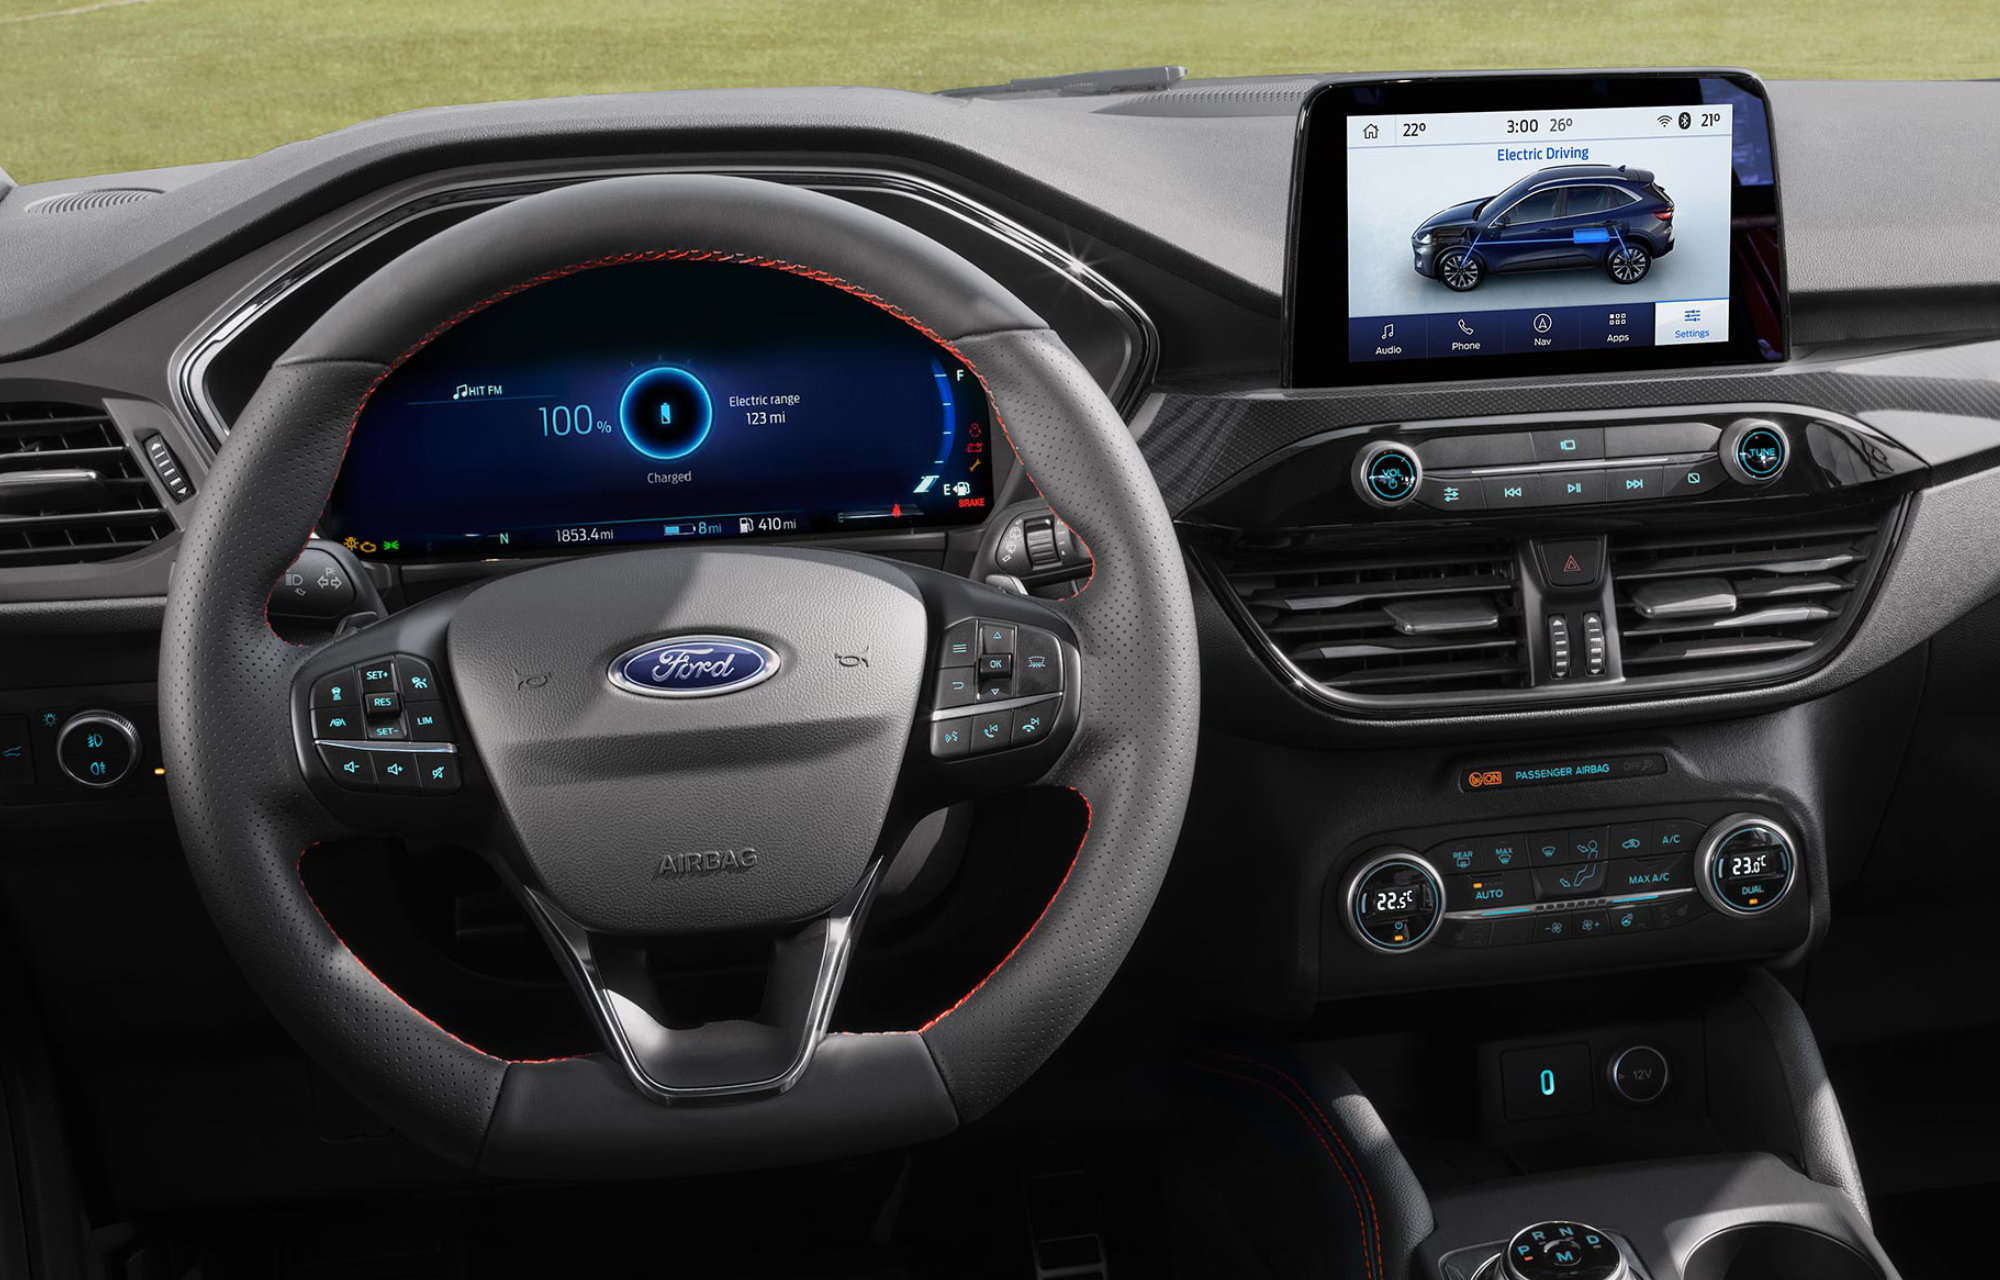 Le Ford Puma embarque les dernières technologies